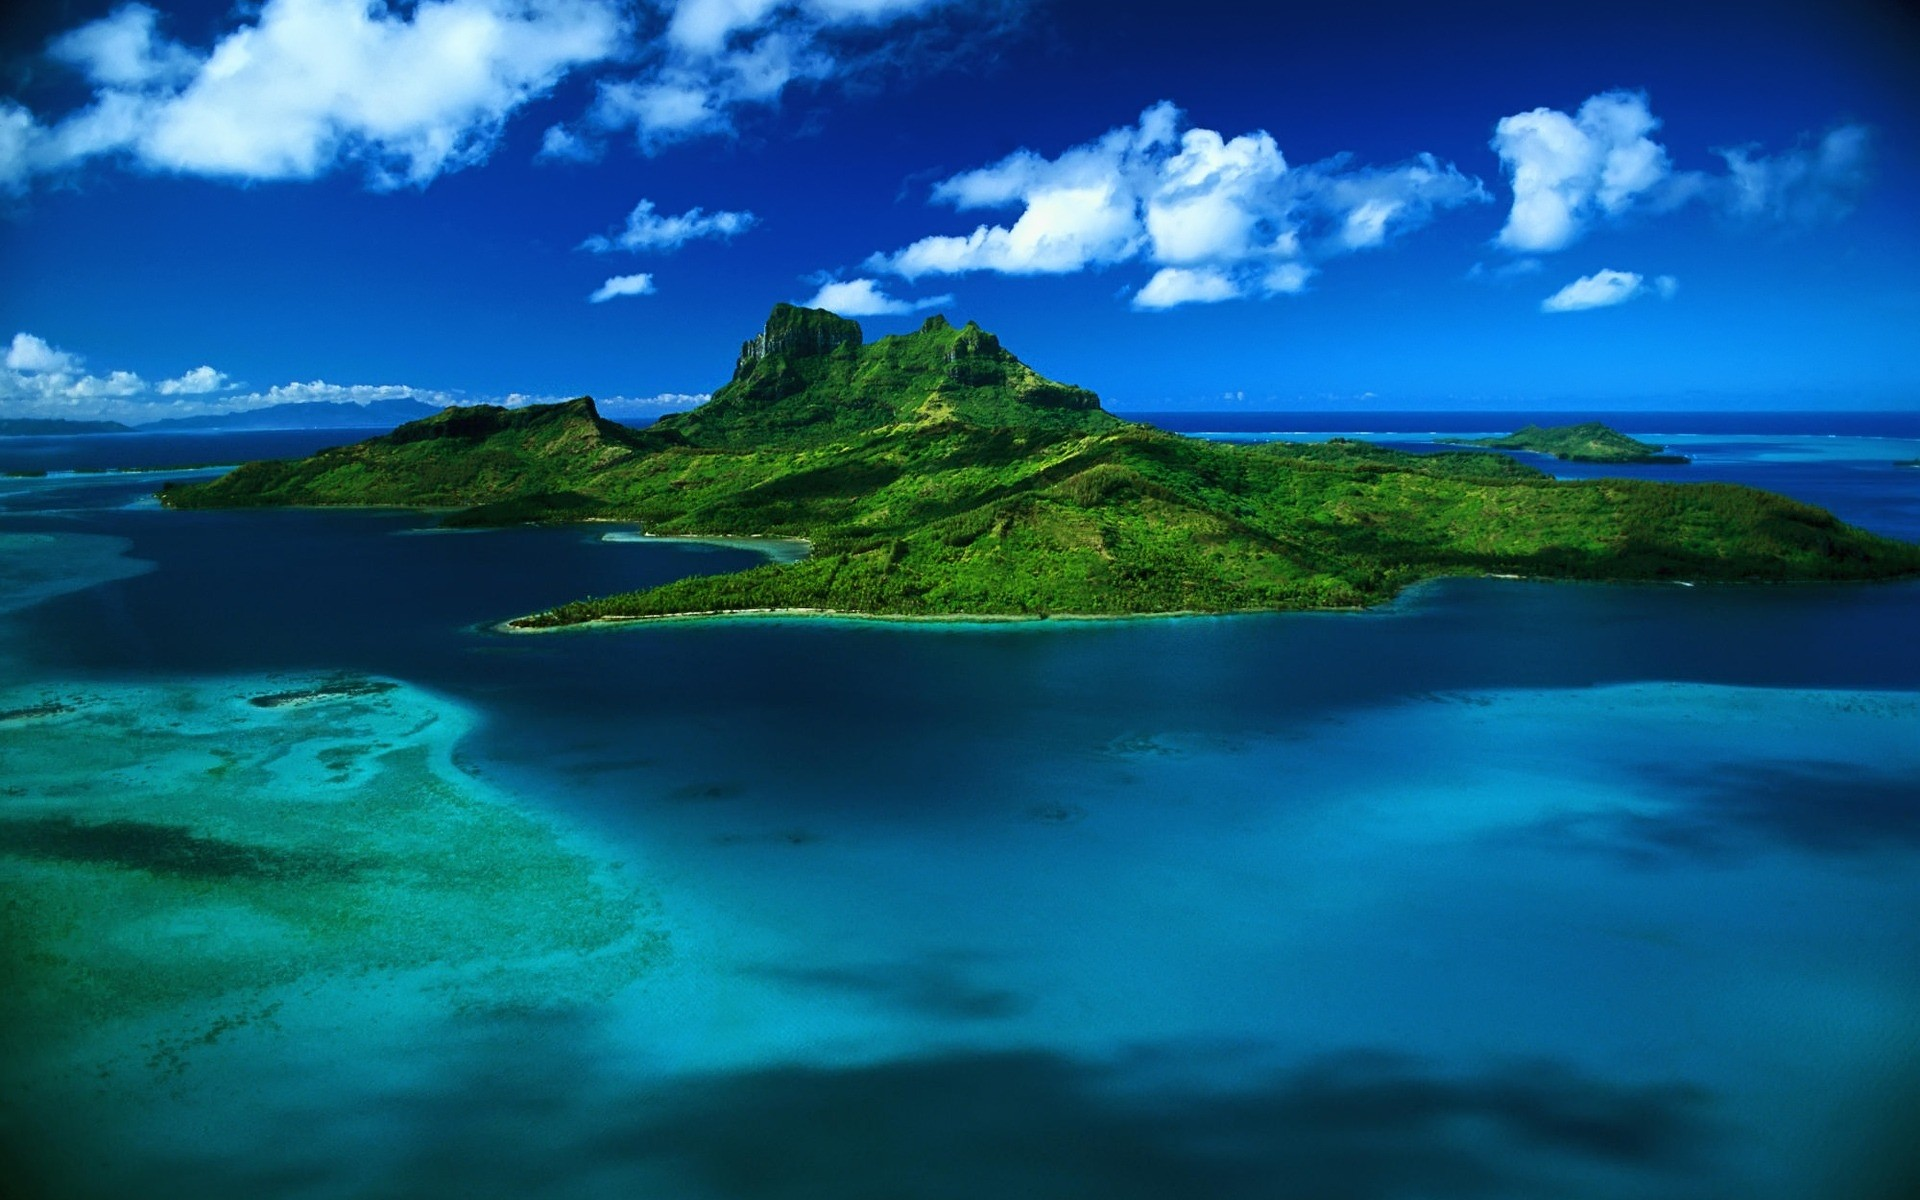 Hd Tropical Island Beach Paradise Wallpapers And Backgrounds: Tropical Island Desktop Backgrounds ·① WallpaperTag